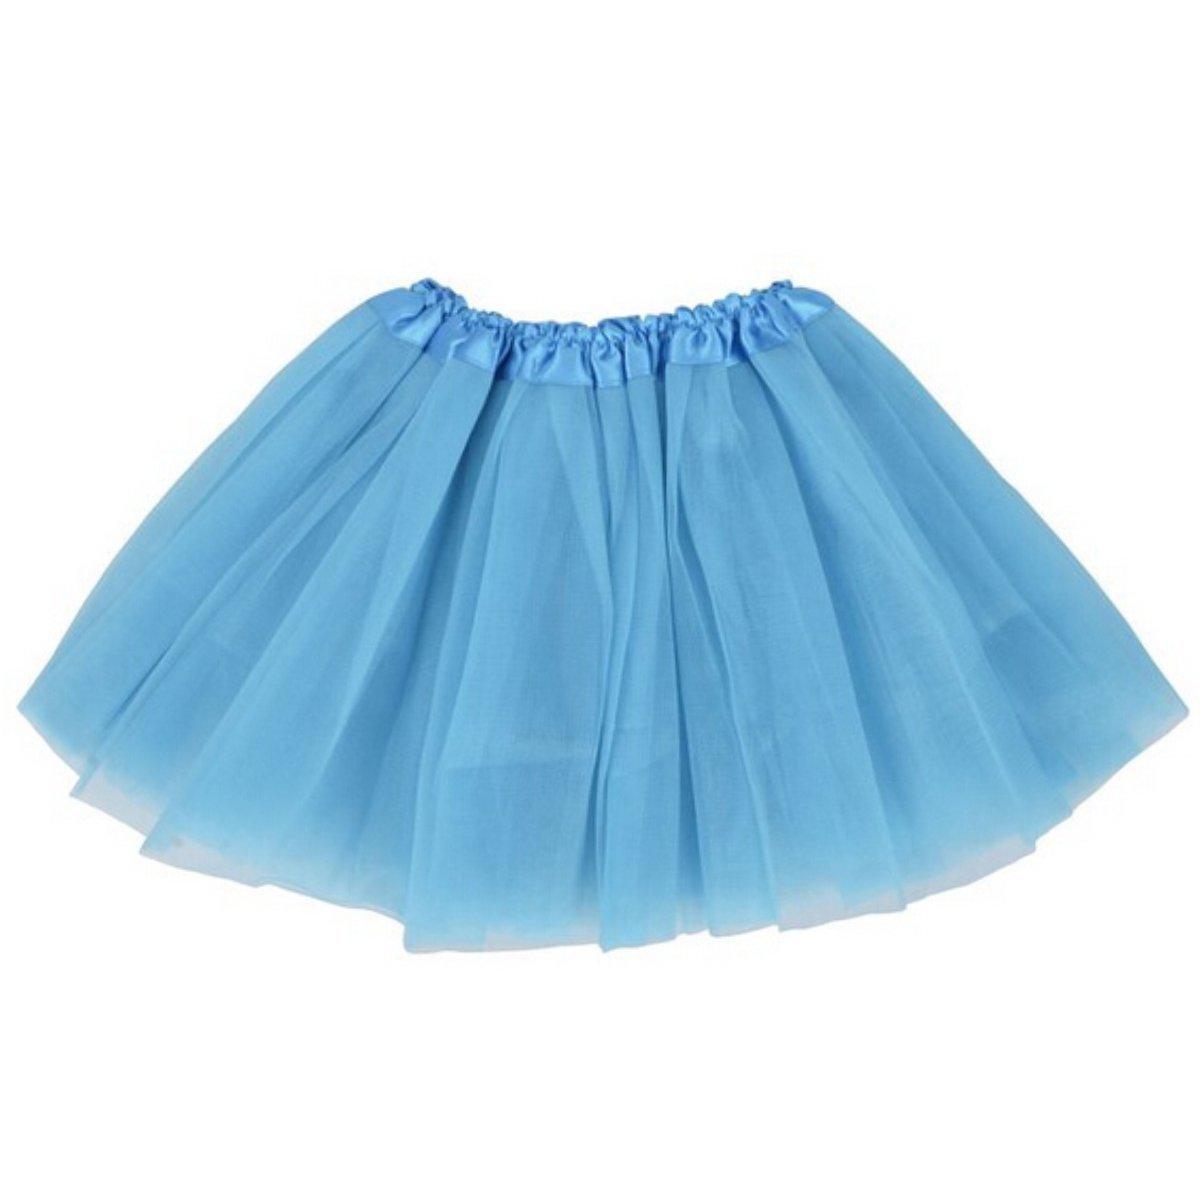 Lanzom Women's Classic Elastic 3-Layered Tulle Tutu Skirt Ballet Party Costume Tutu Skirt0018